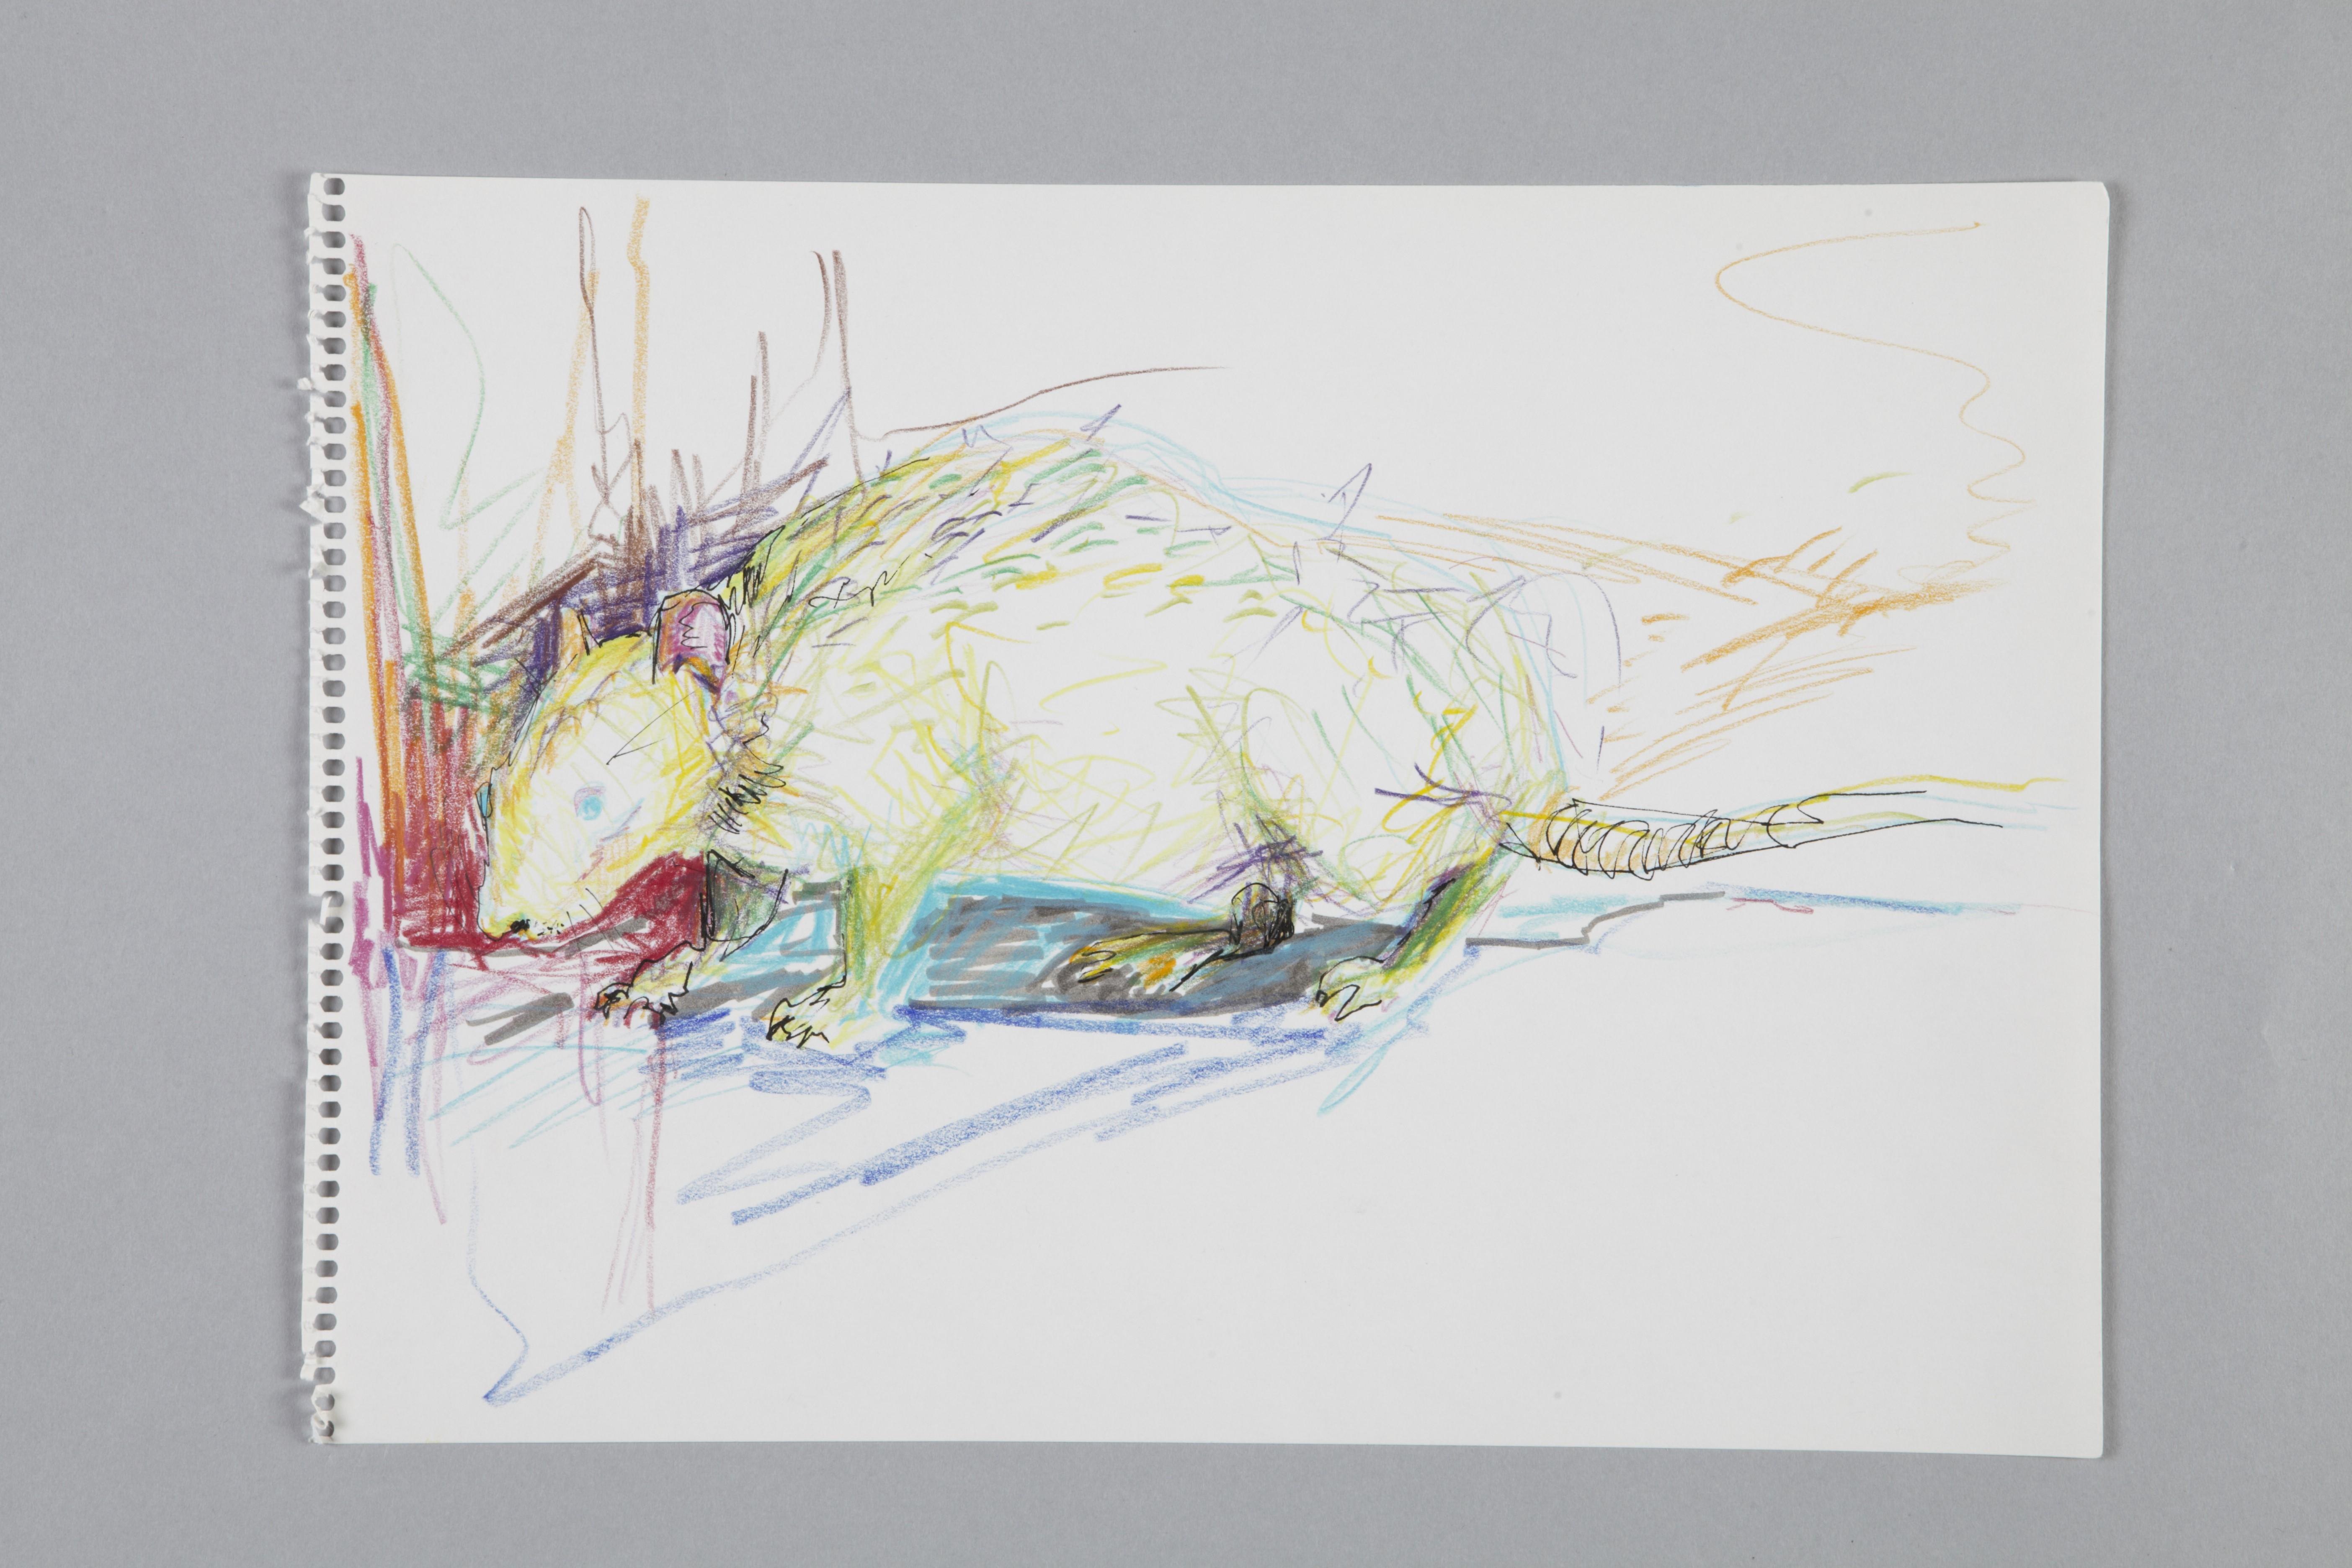 Color pencils and fineliner on paper | Ratte II | 40×30 | 2016 | Jule Sonnentag